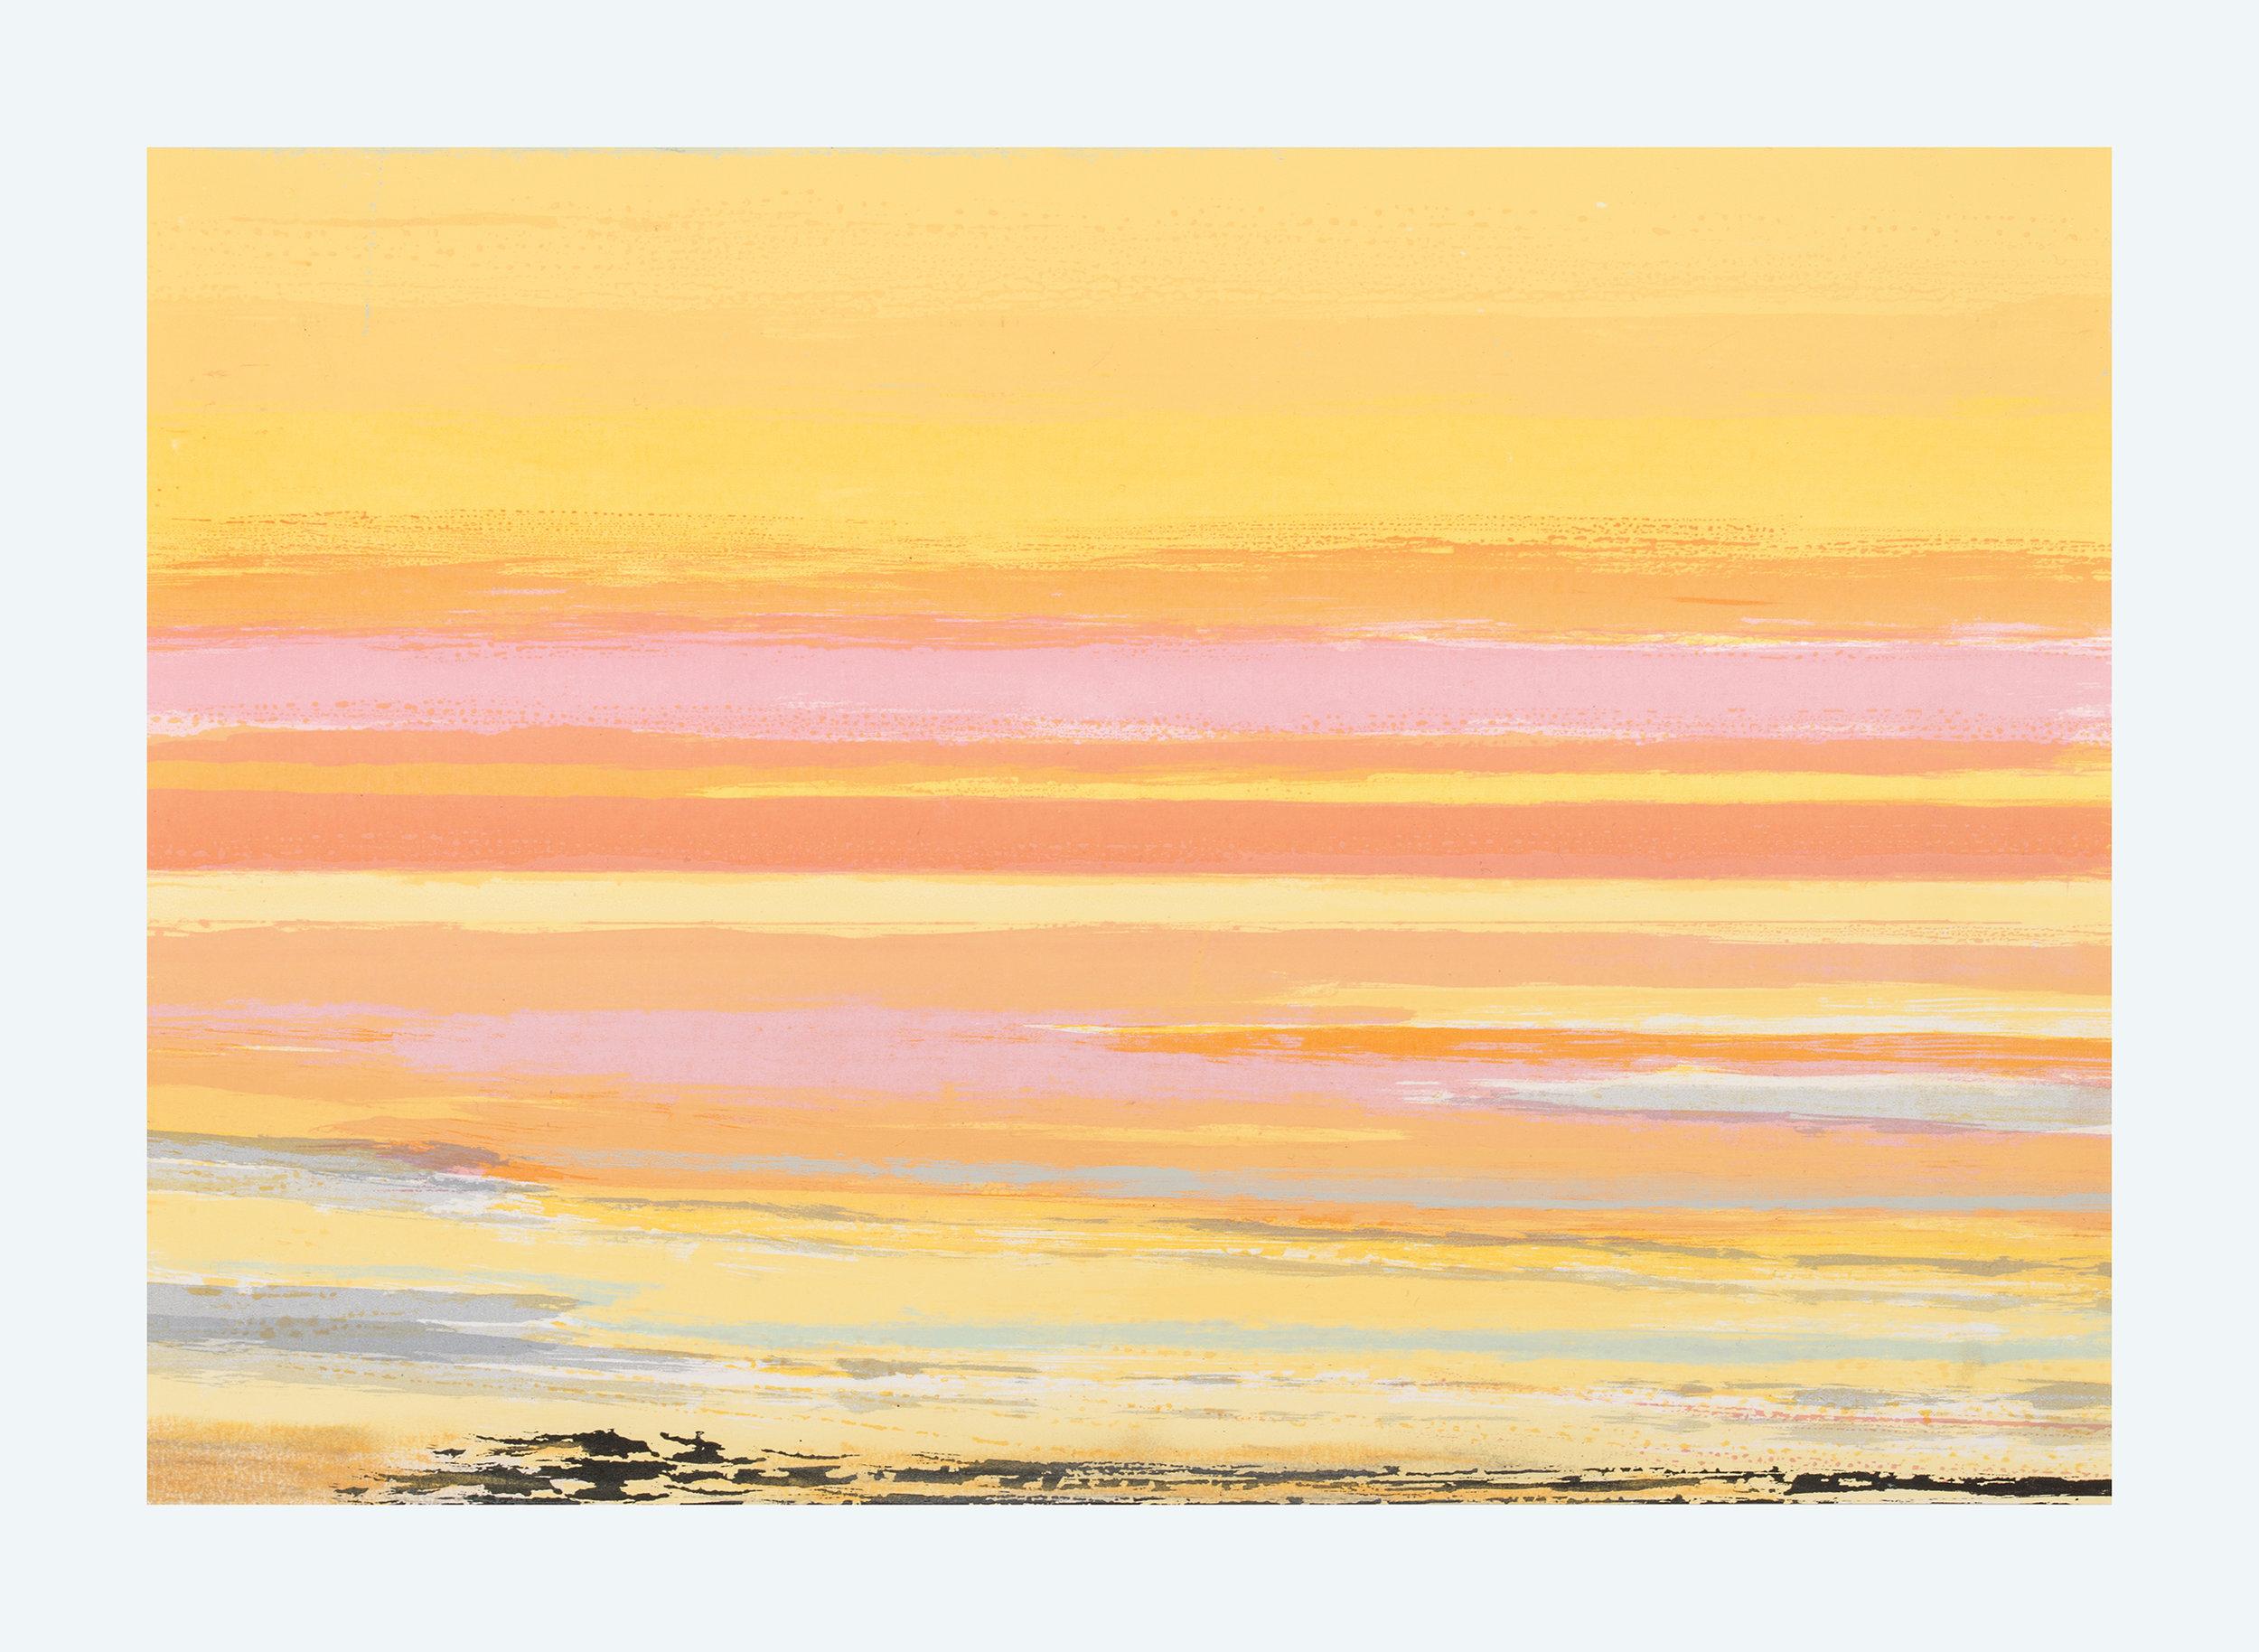 21 Golden Memory, 35x43cm, screen print, ed of 10